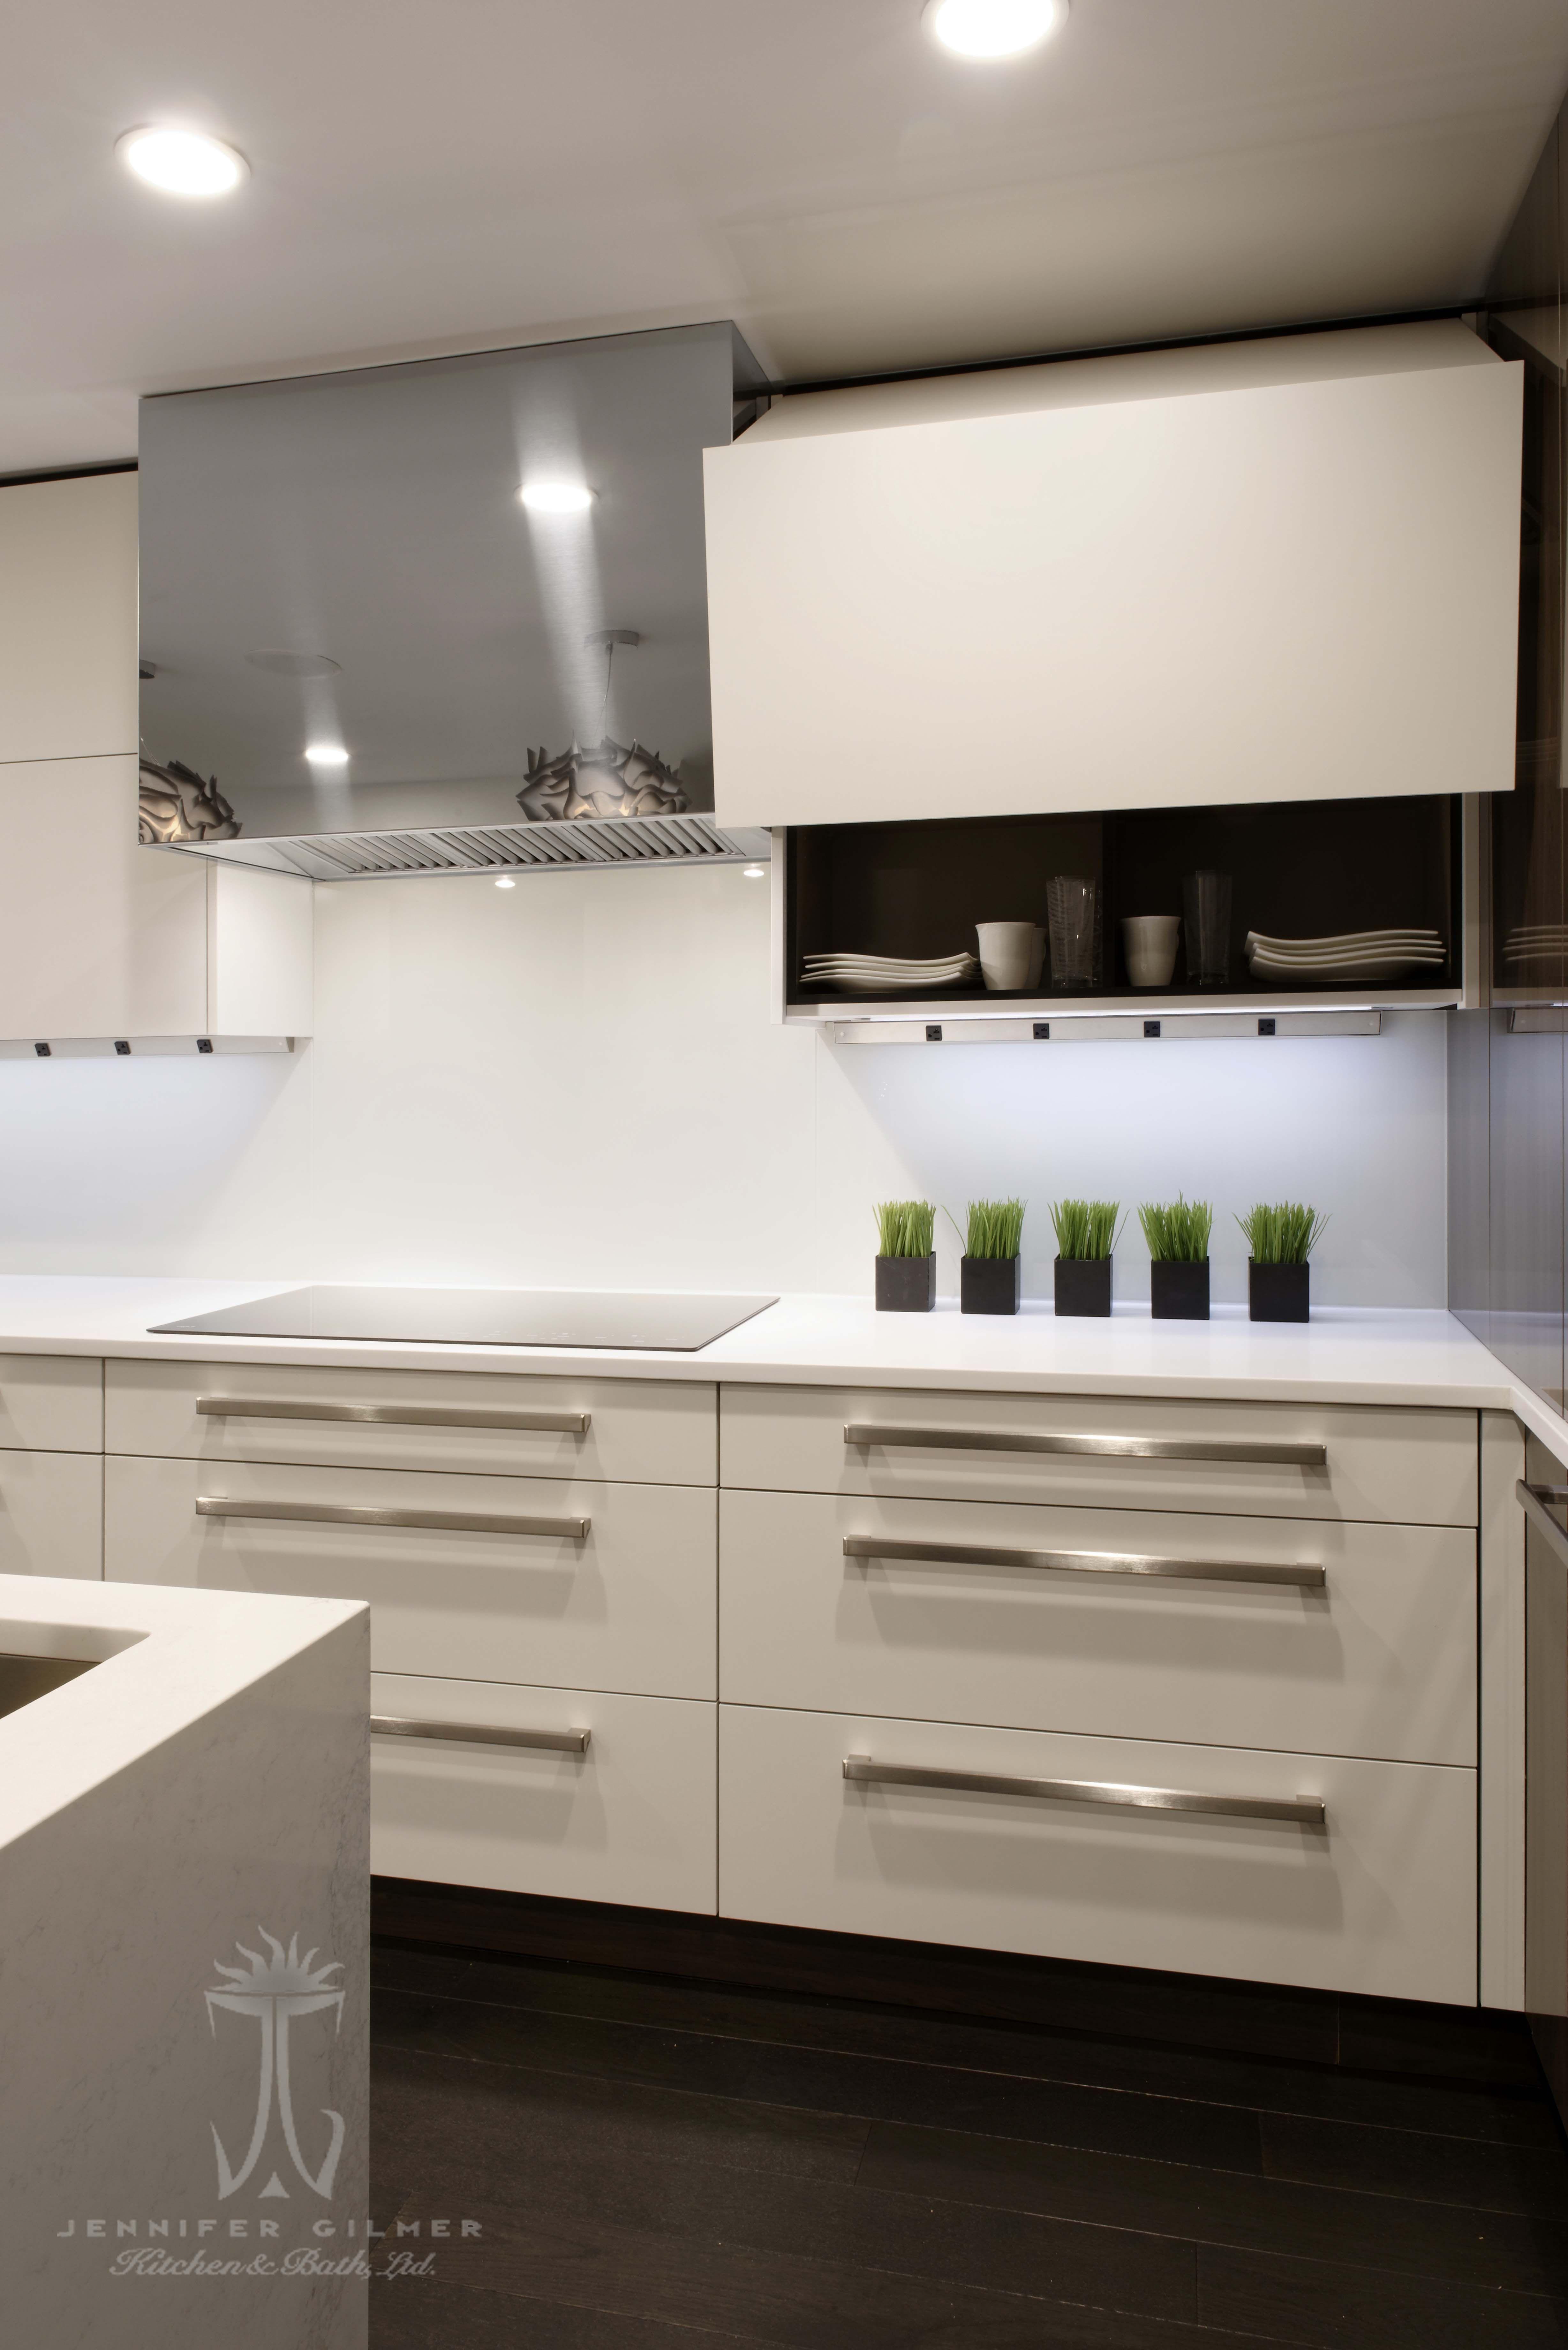 Kitchen design by #PaulBentham4JenniferGilmer in Columbia, MD ...